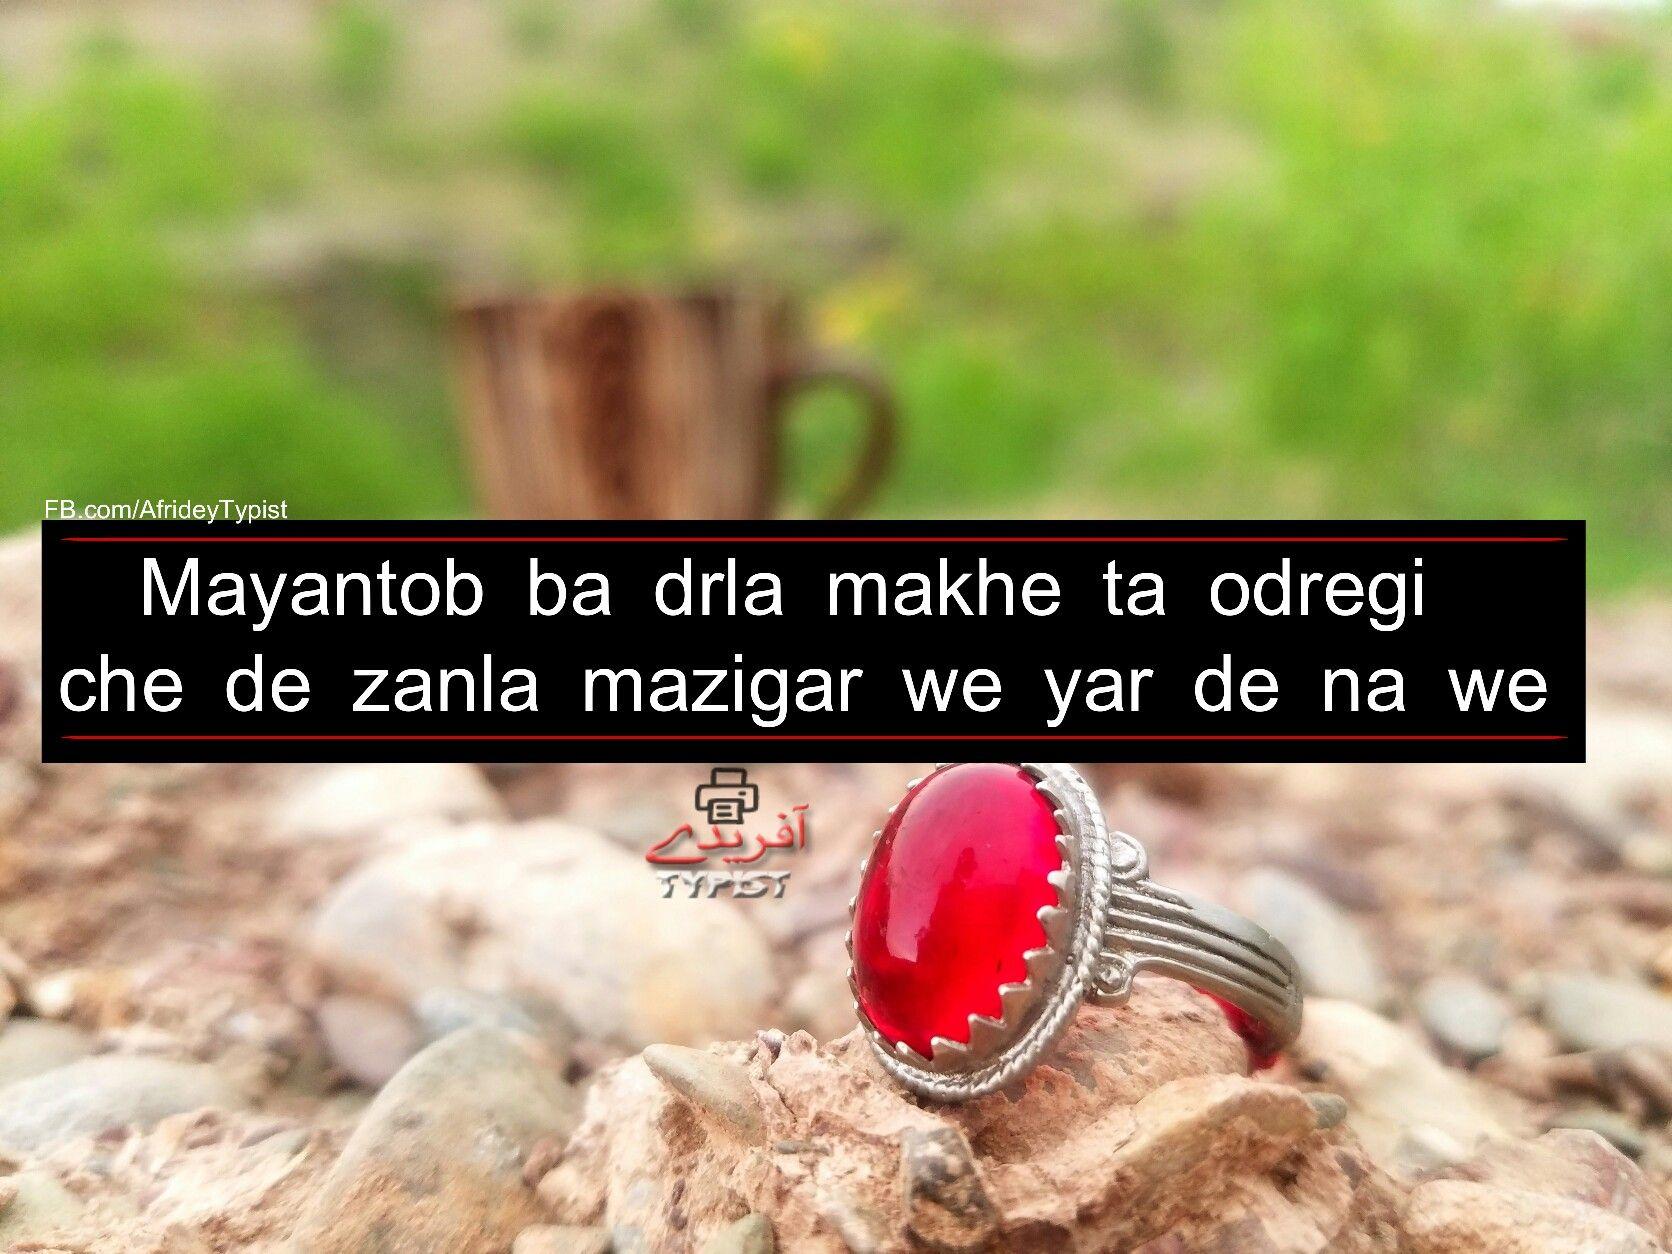 Pashto poetry ❤❤❤❤ Shaho❤❤❤❤ | ᏢᎪՏᎻͲϴ ᏢϴᎬͲᎡᎽ